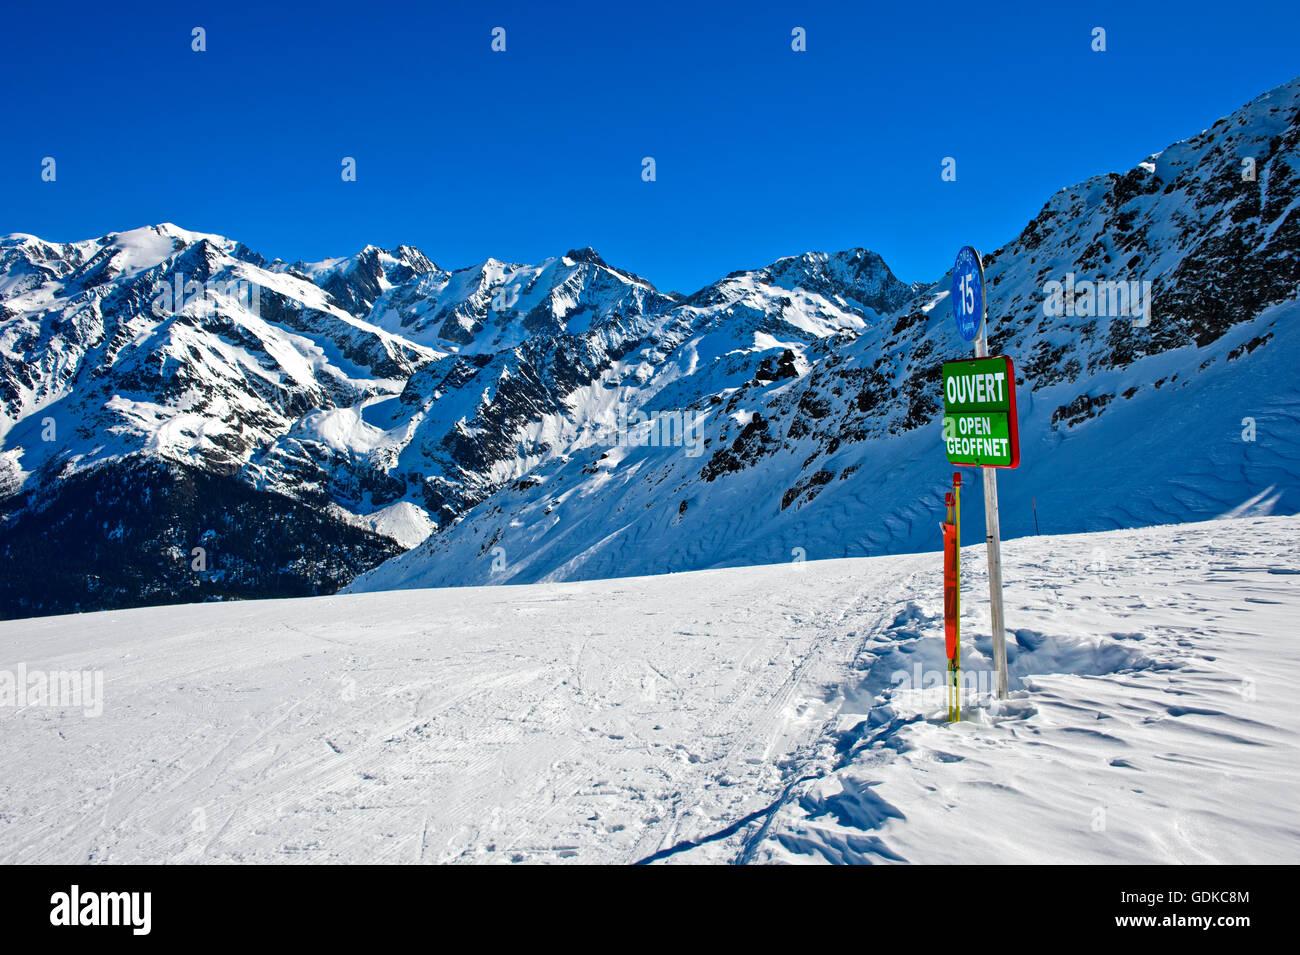 Open, sign on ski slope, pisted run, Les Contamines-Montjoie ski resort, Haute-Savoie, France - Stock Image